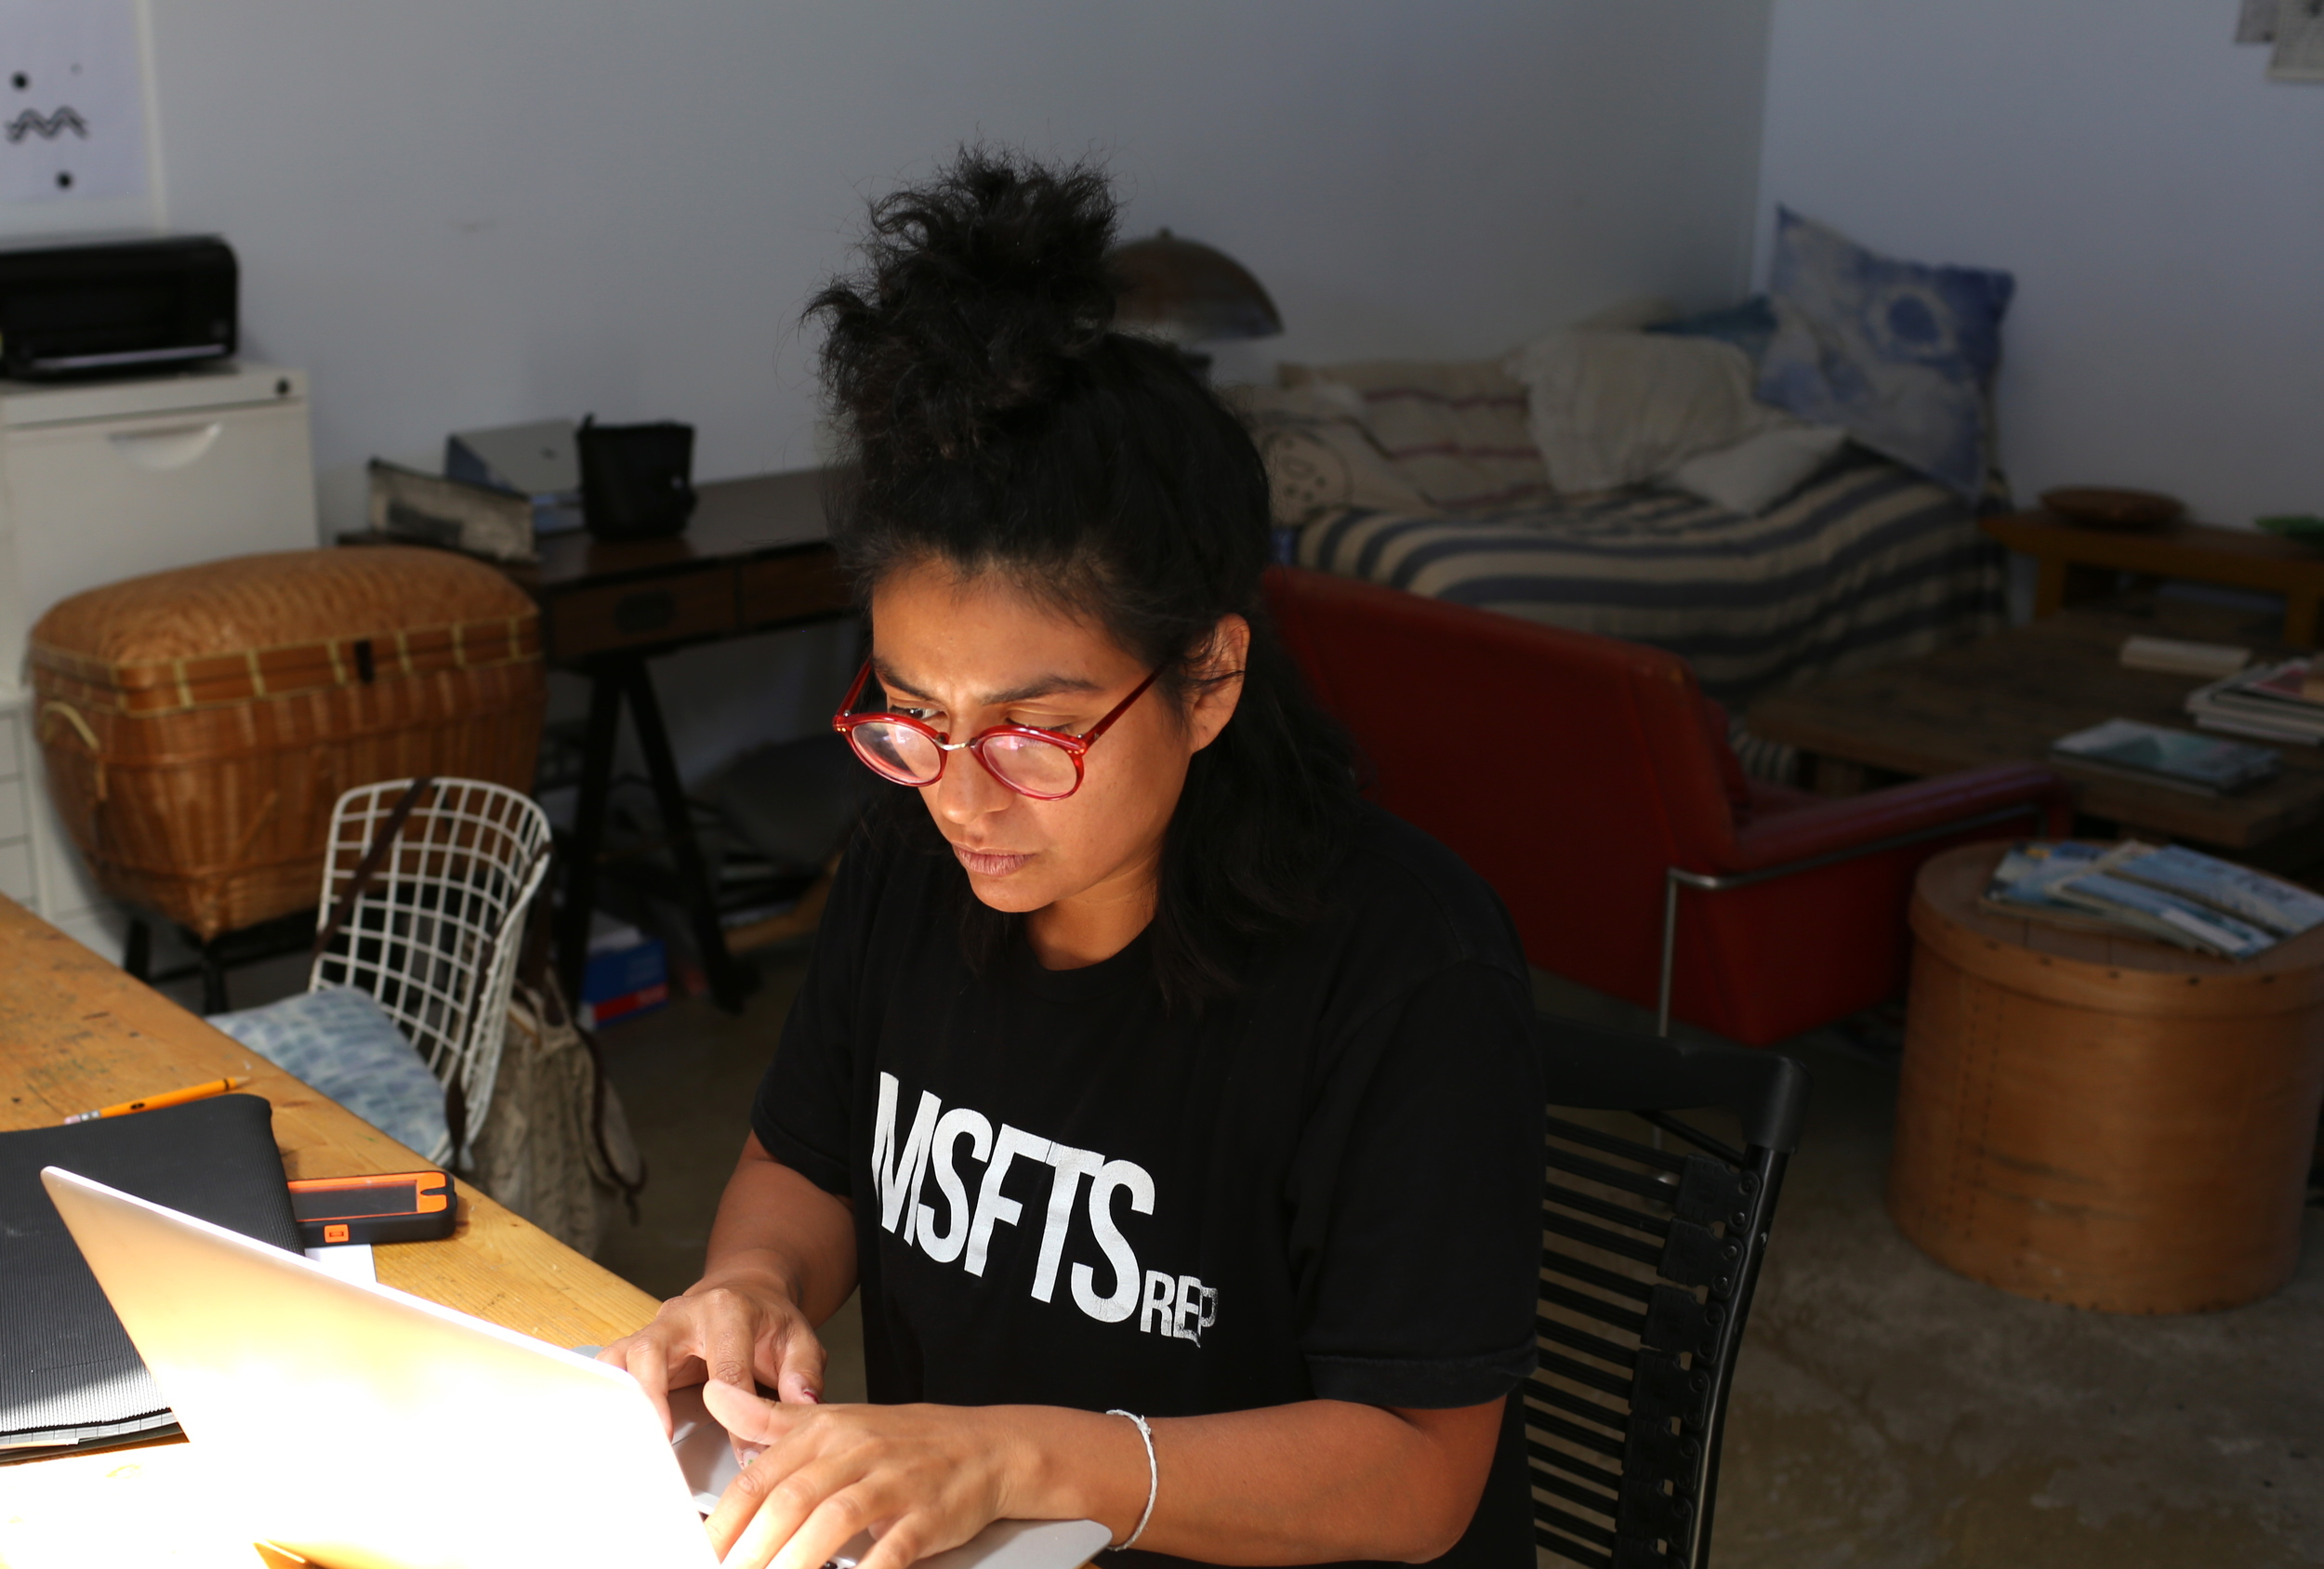 This is Elisa Shea, Alex's studio partner, working on some online sales.